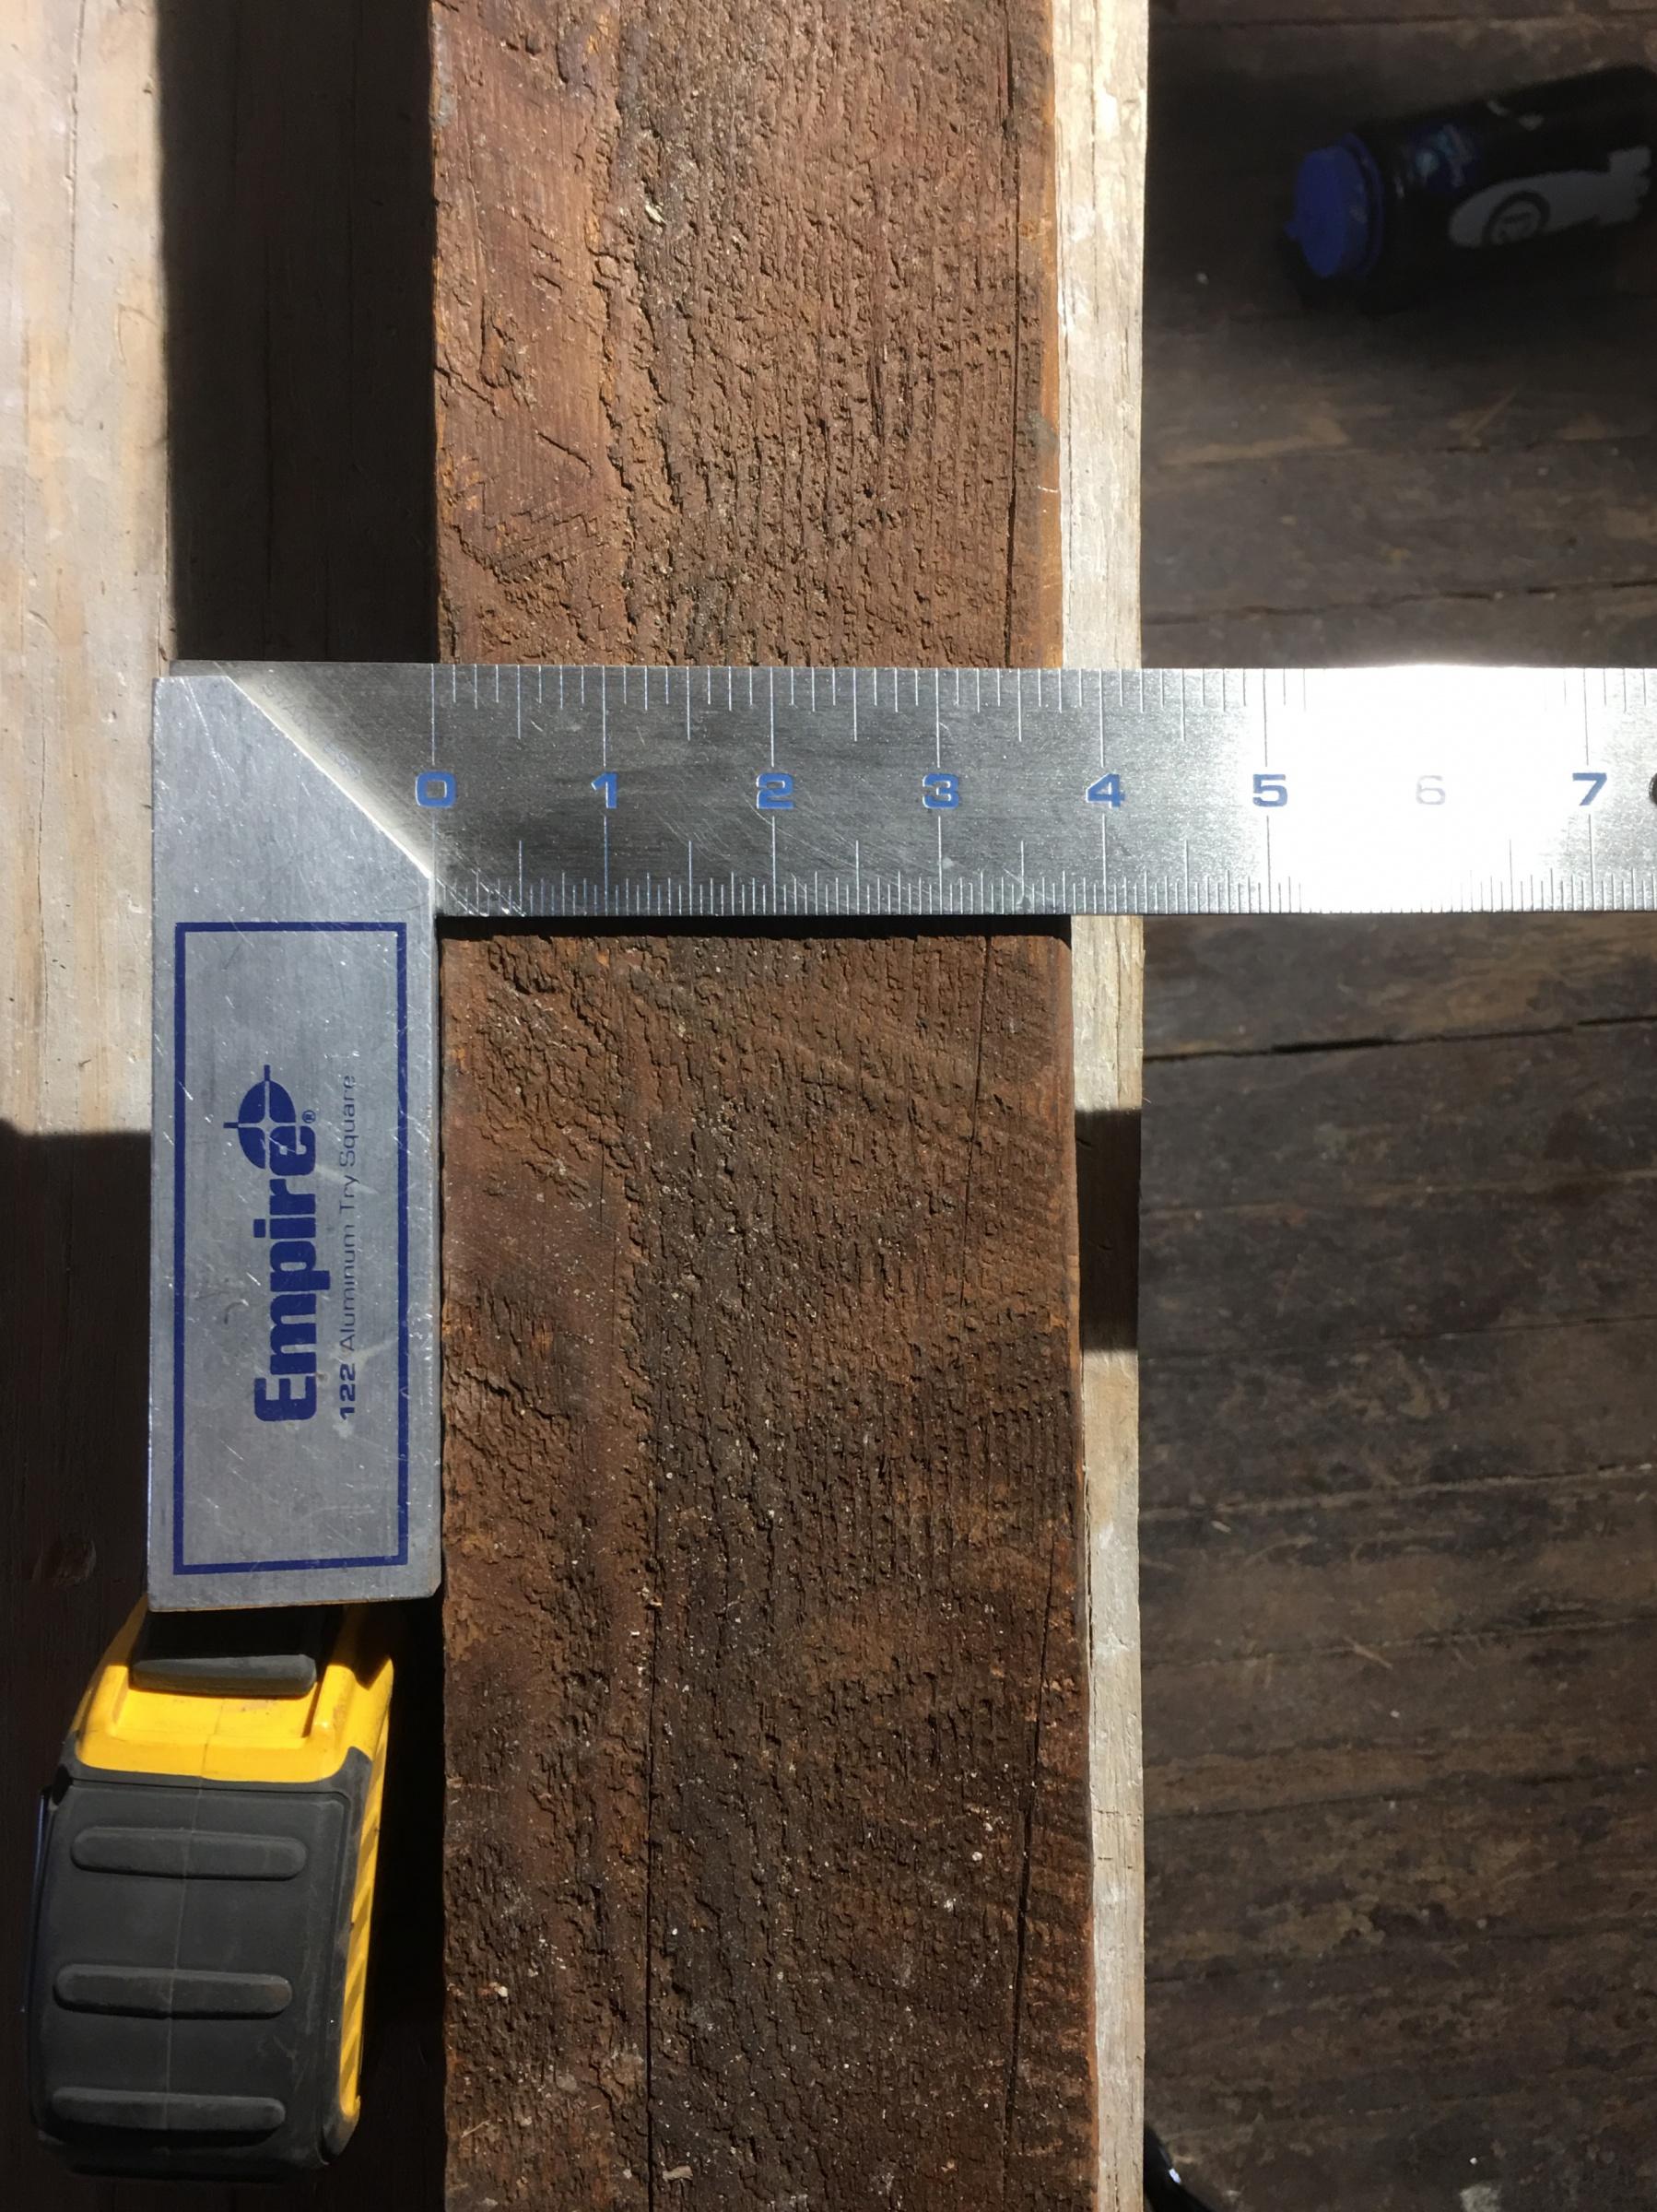 Relcaimed wood to build stair treads-img_4637.jpg